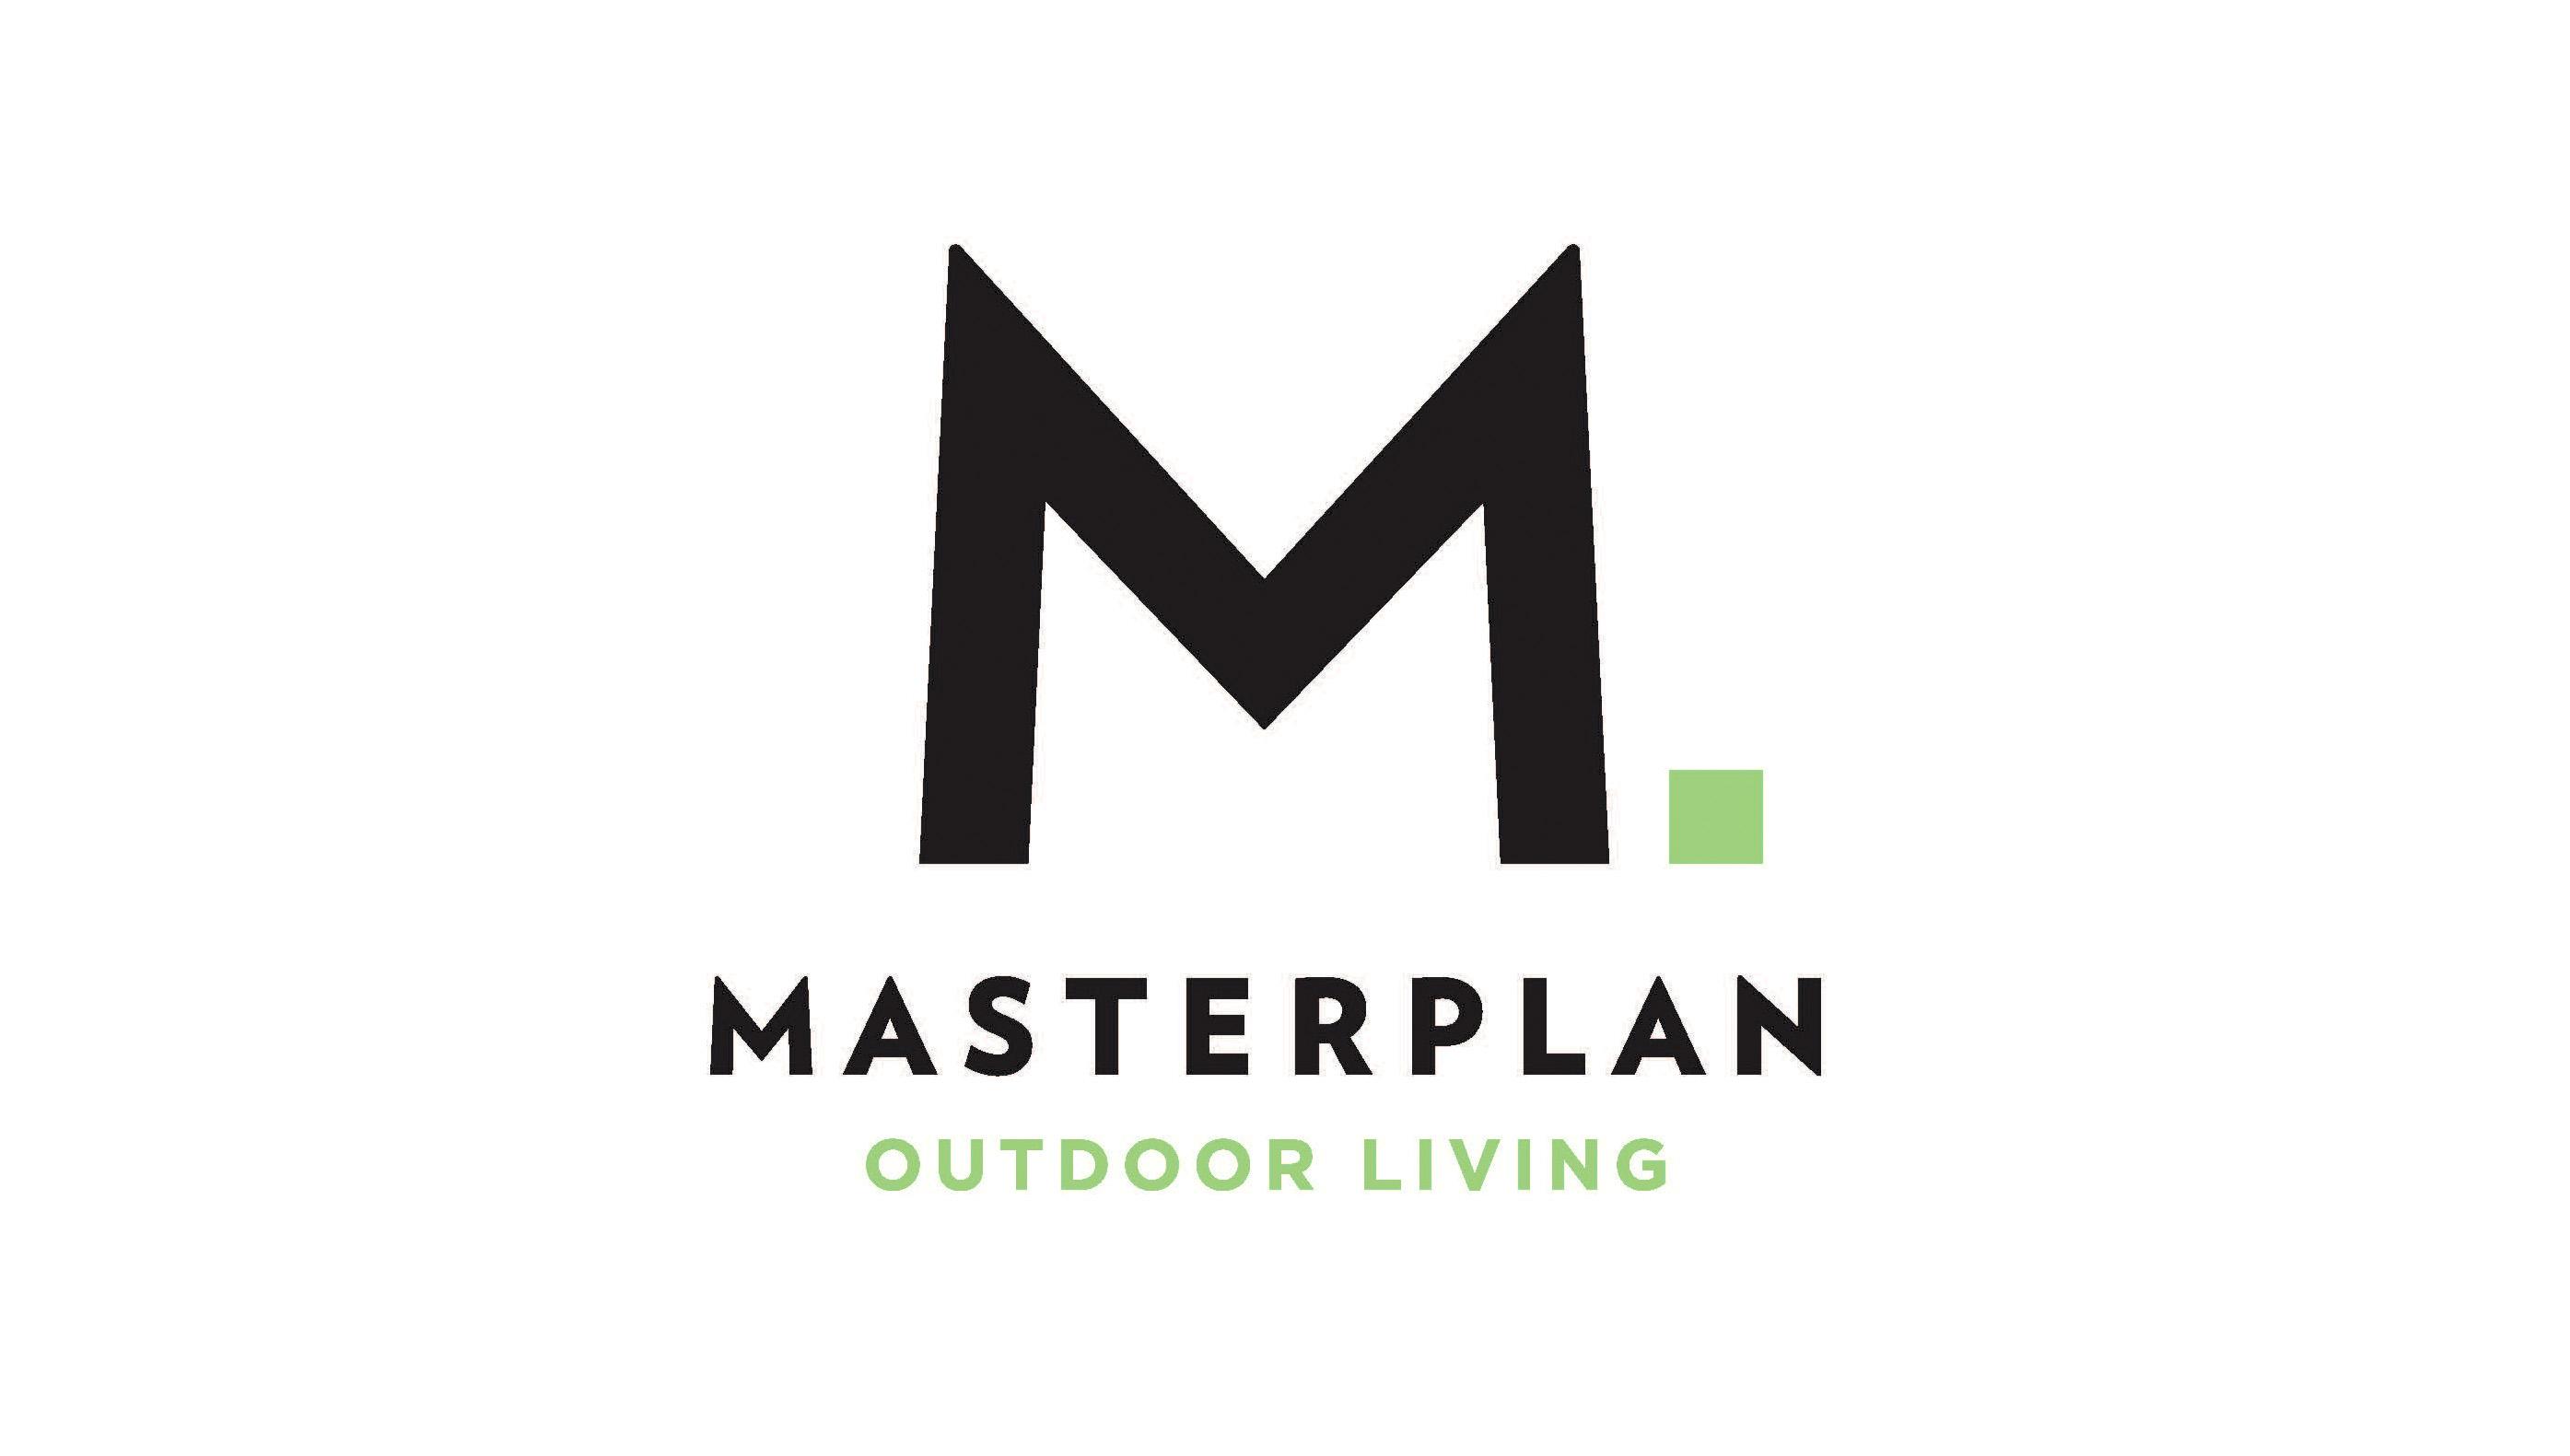 MasterPLAN Outdoor Living « MasterPLAN Outdoor Living on Masterplan Outdoor Living id=45125